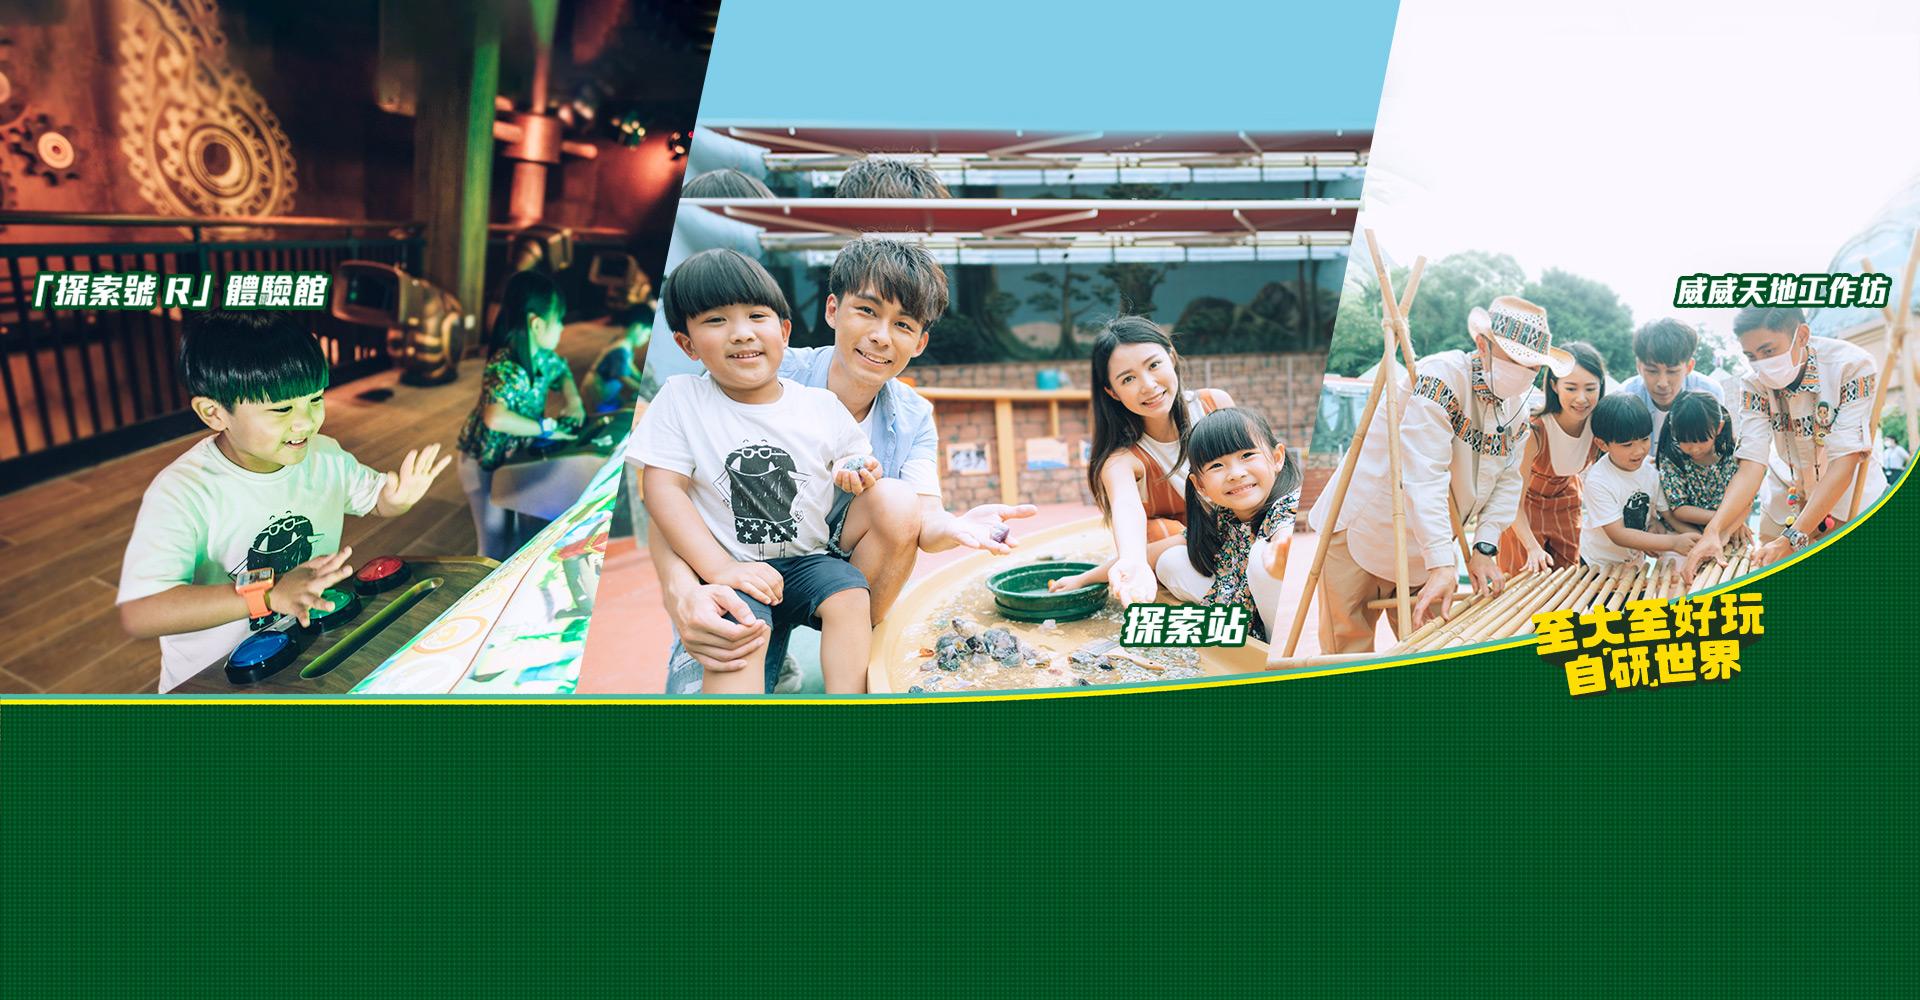 https://media.oceanpark.com.hk/files/s3fs-public/summer_inside_desktop_tc_3.jpg